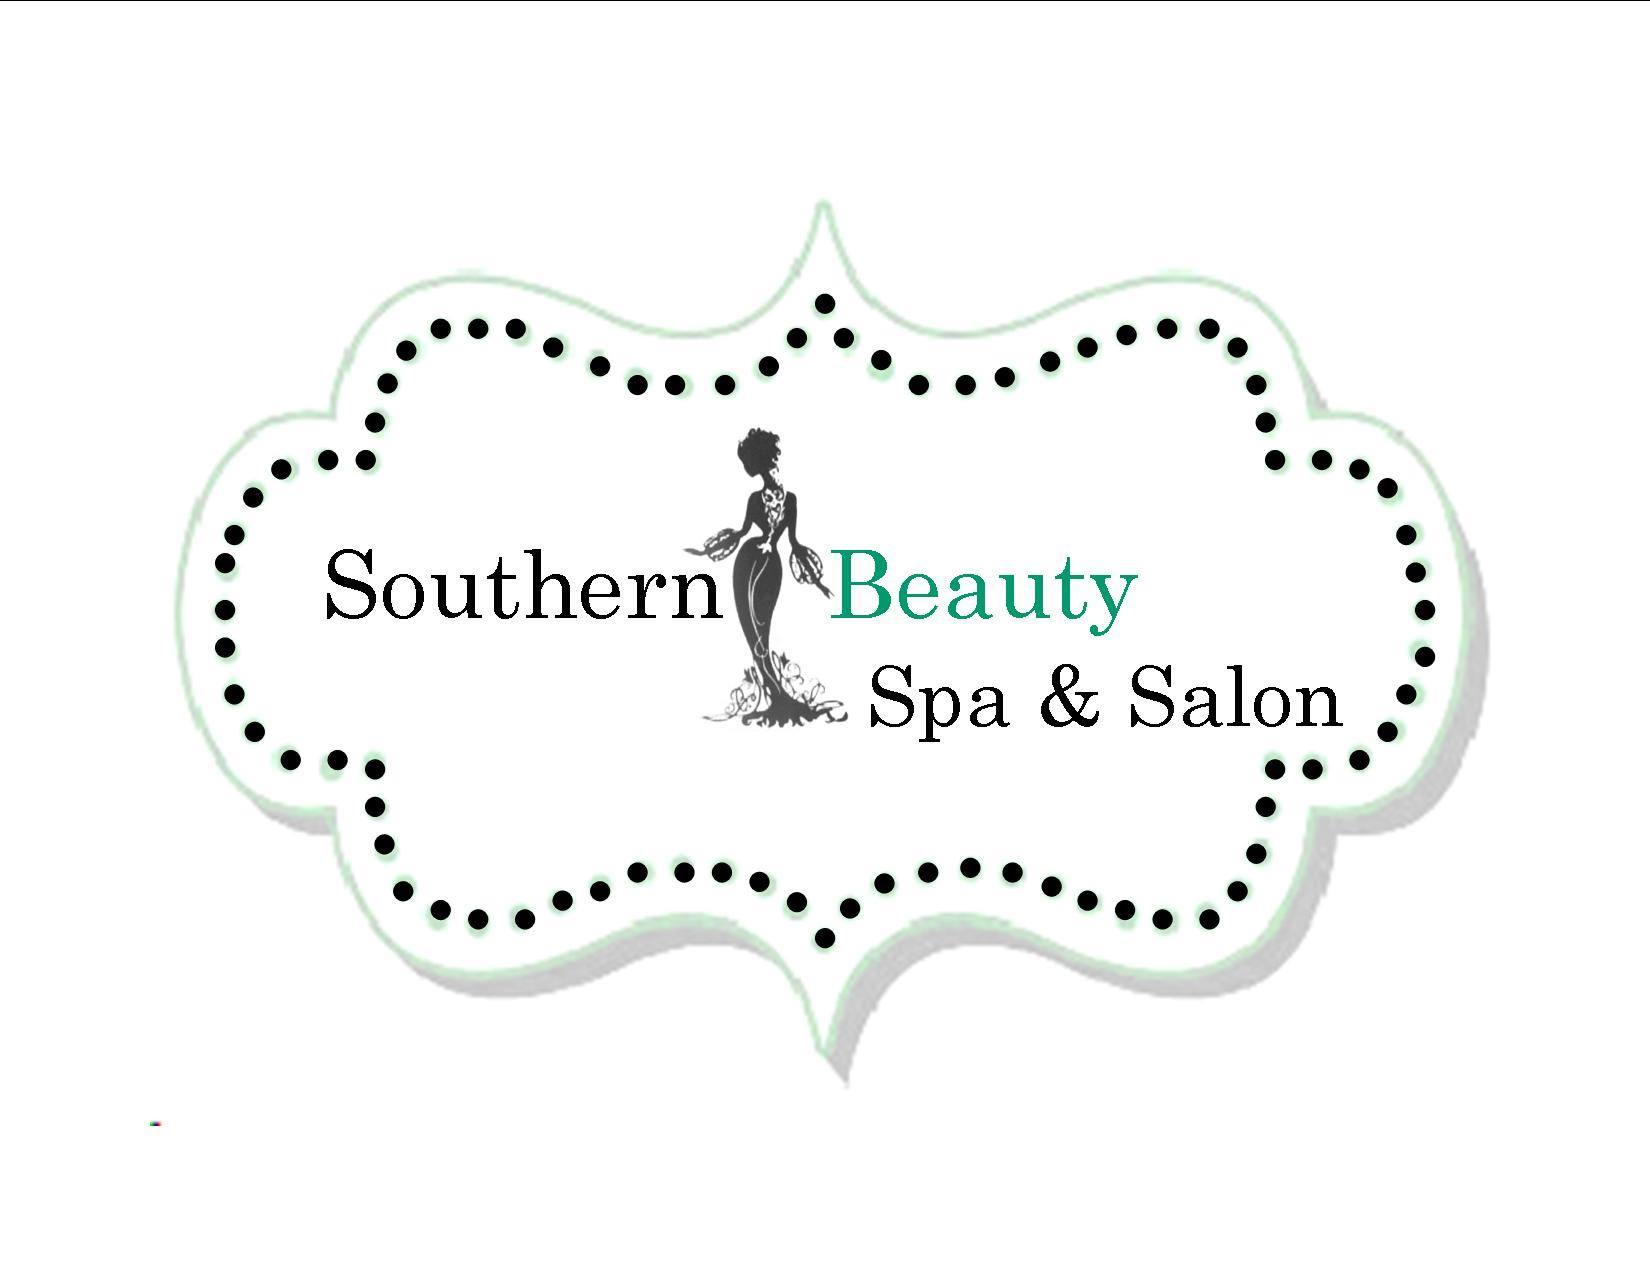 Southern Beauty Spa and Salon